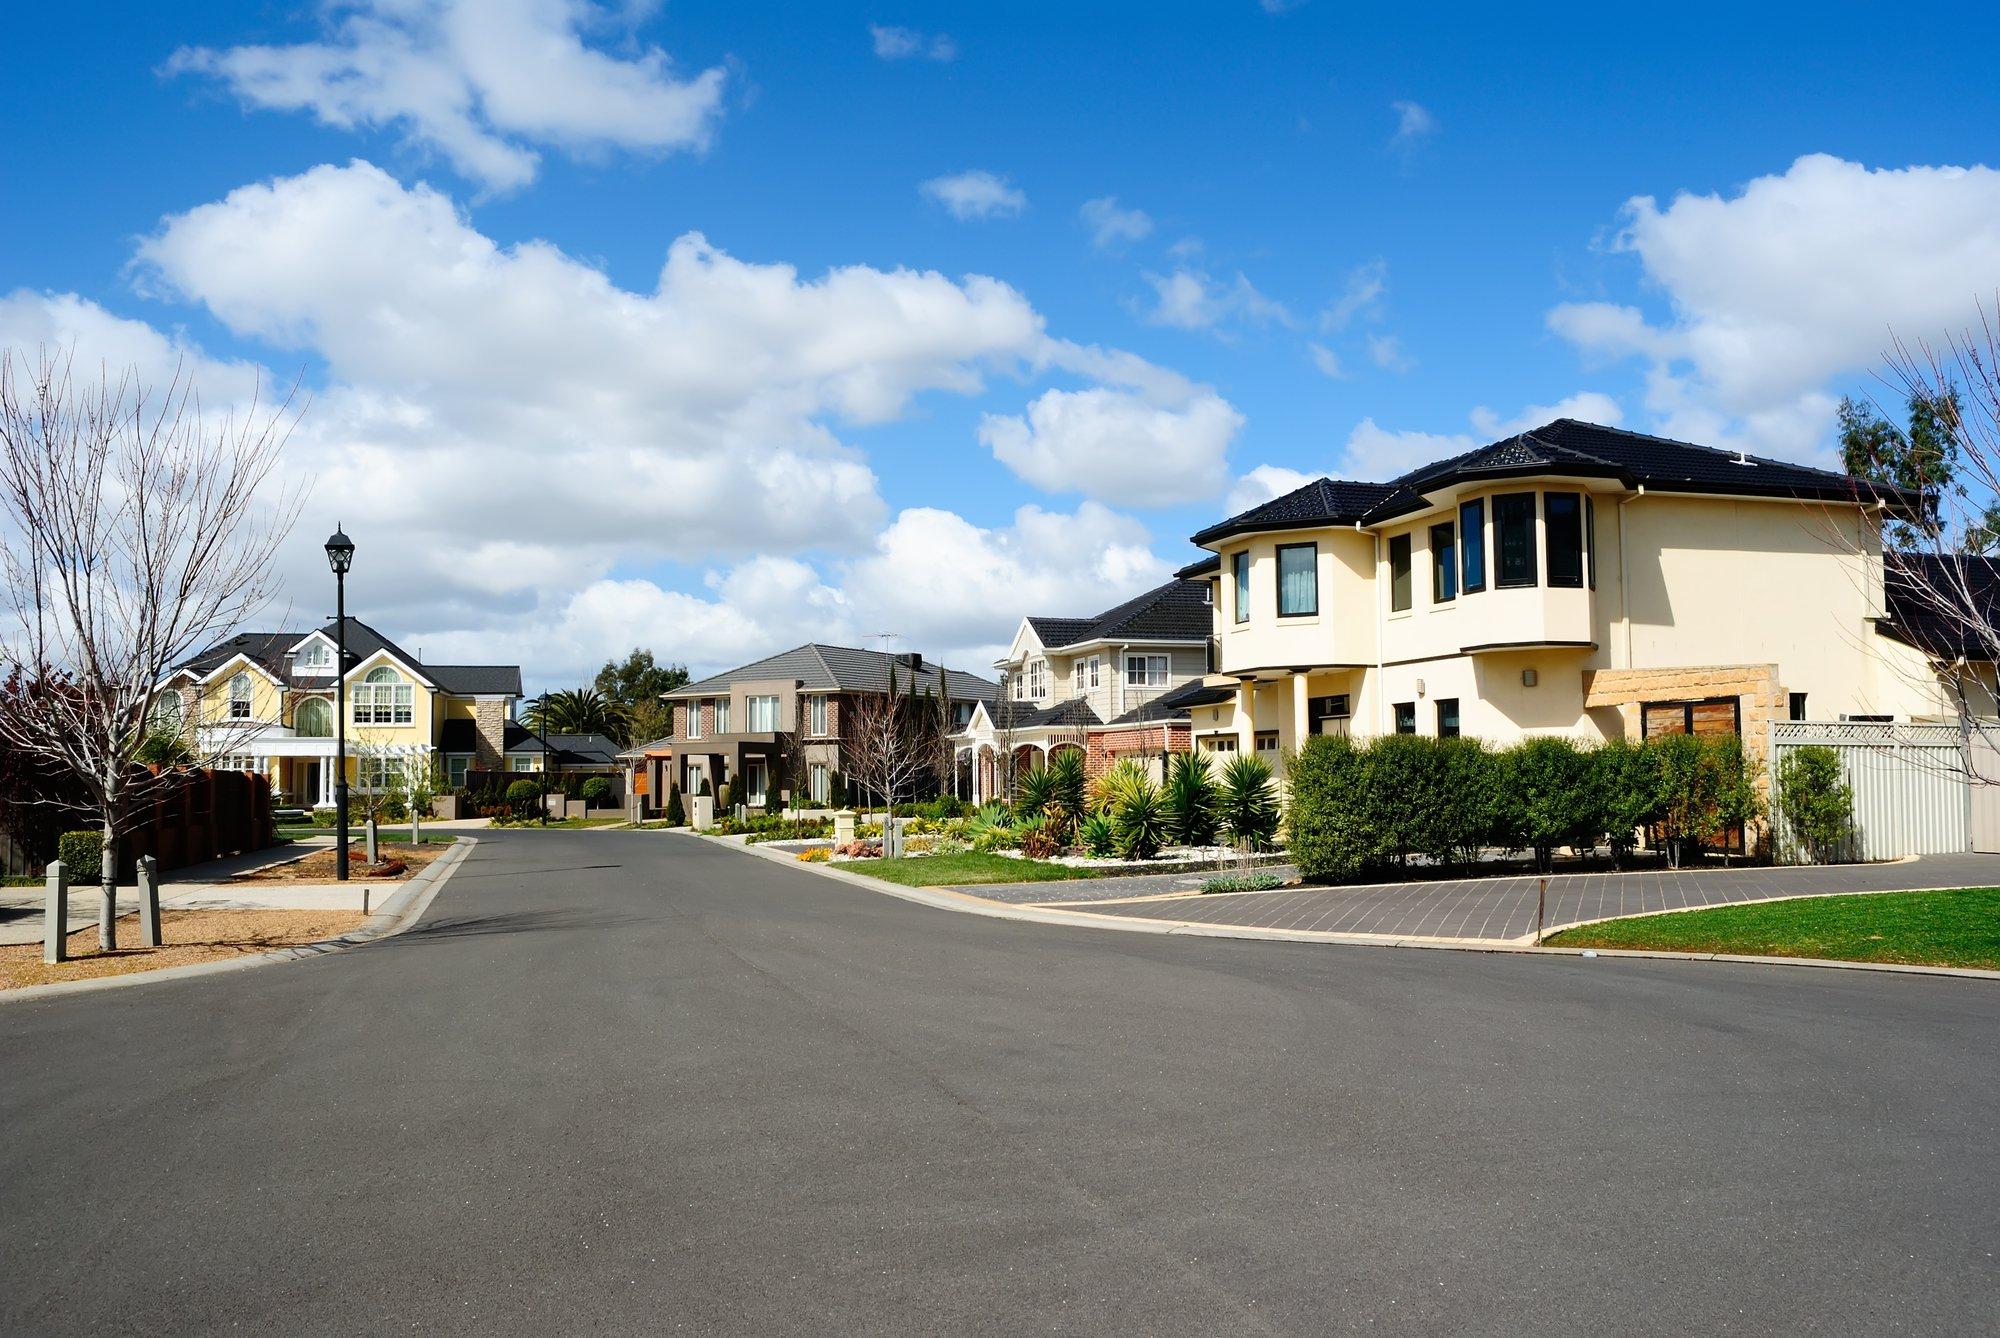 Modern houses in a suburban neighborhood